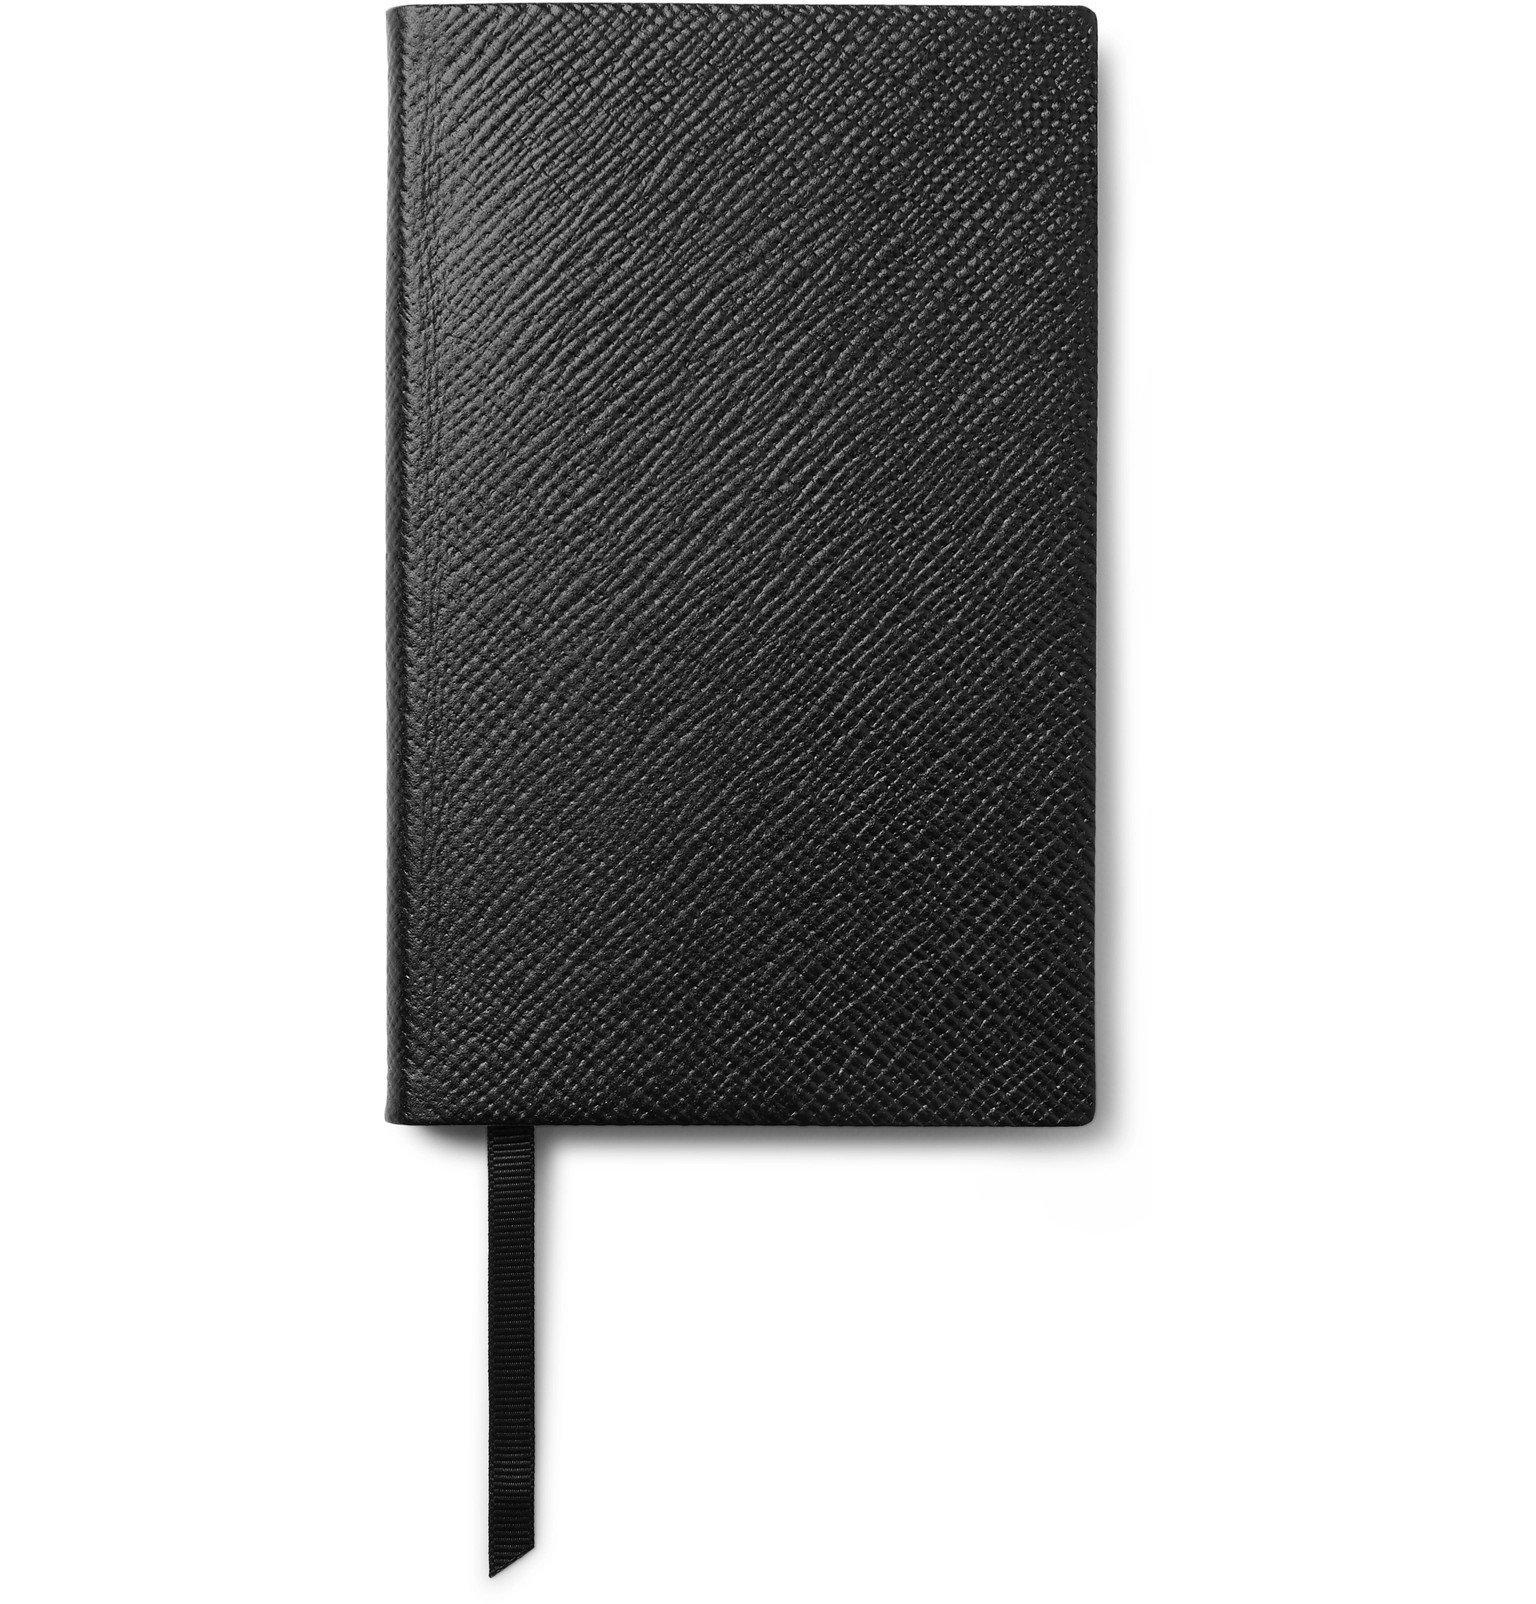 Smythson - Panama Cross-Grain Leather Notebook - Black